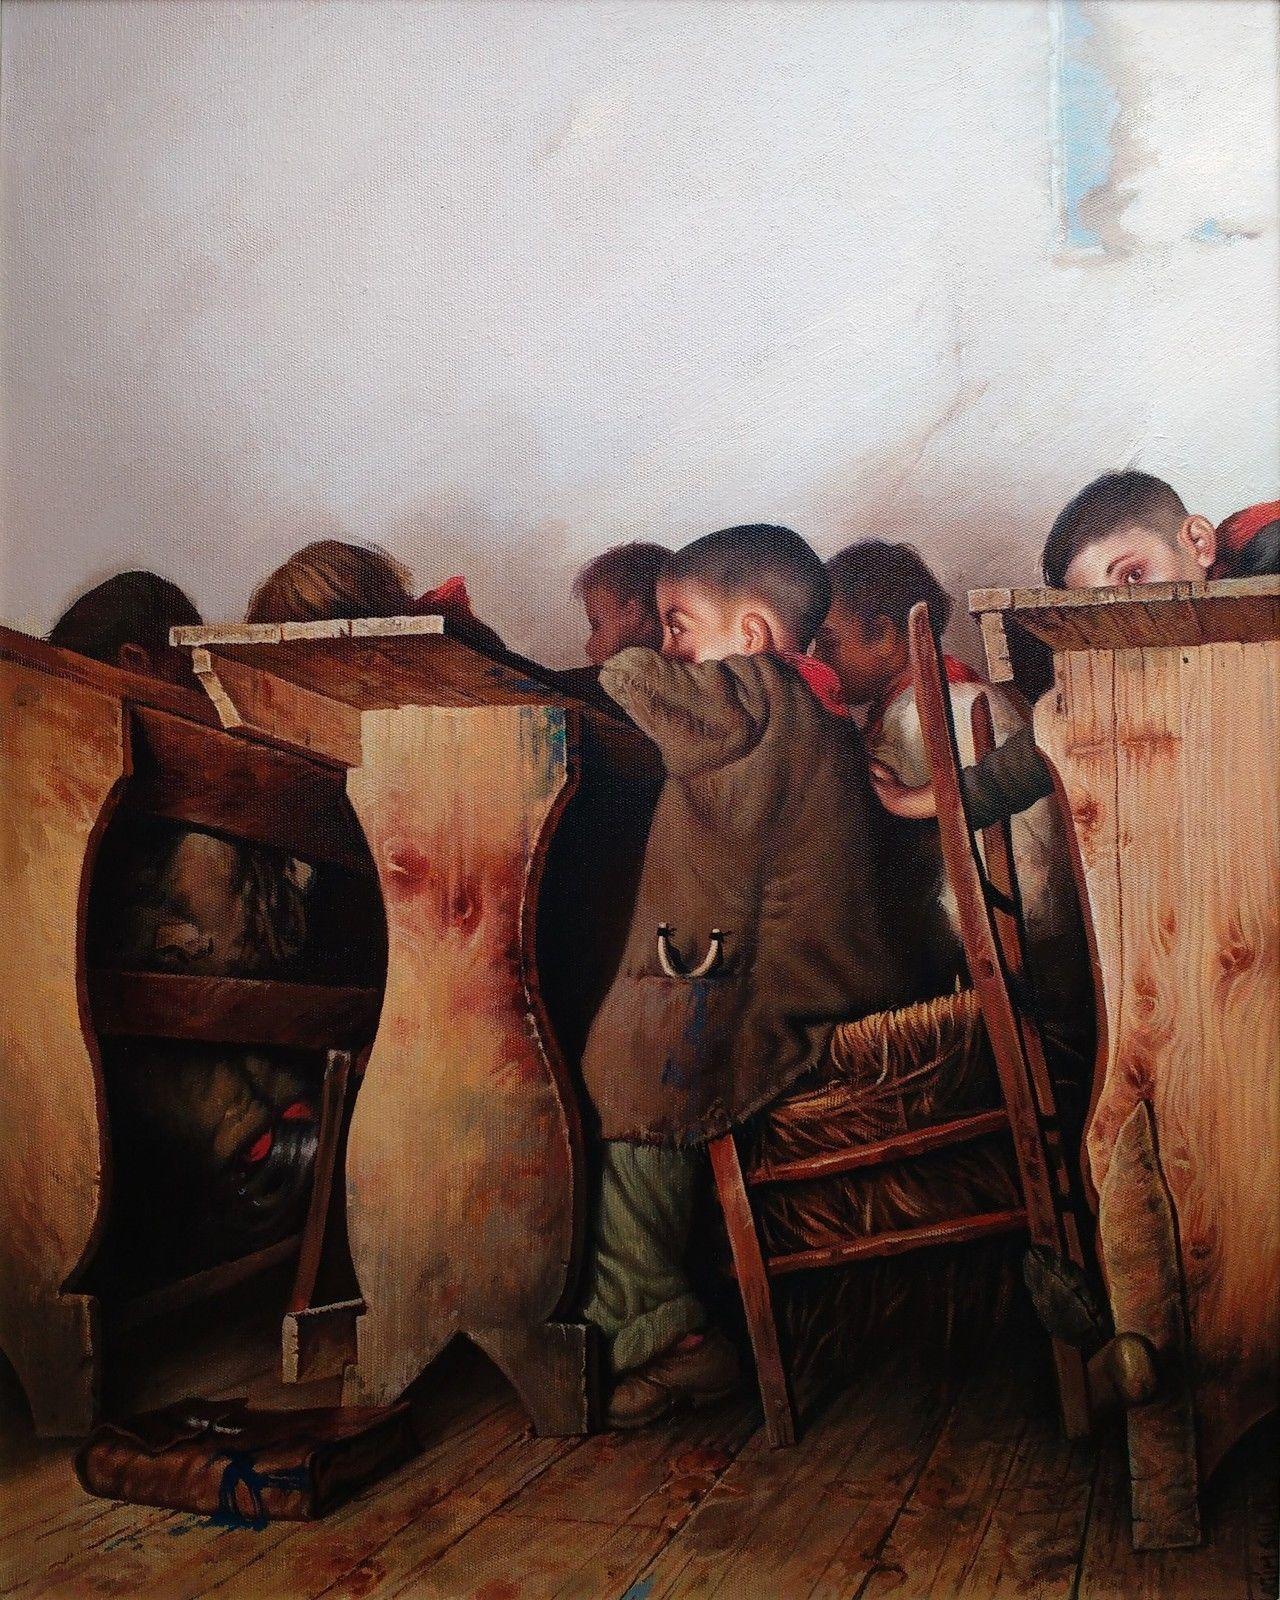 'School Desks' Agim Sulaj Oil on canvas, 50cm x 60cm